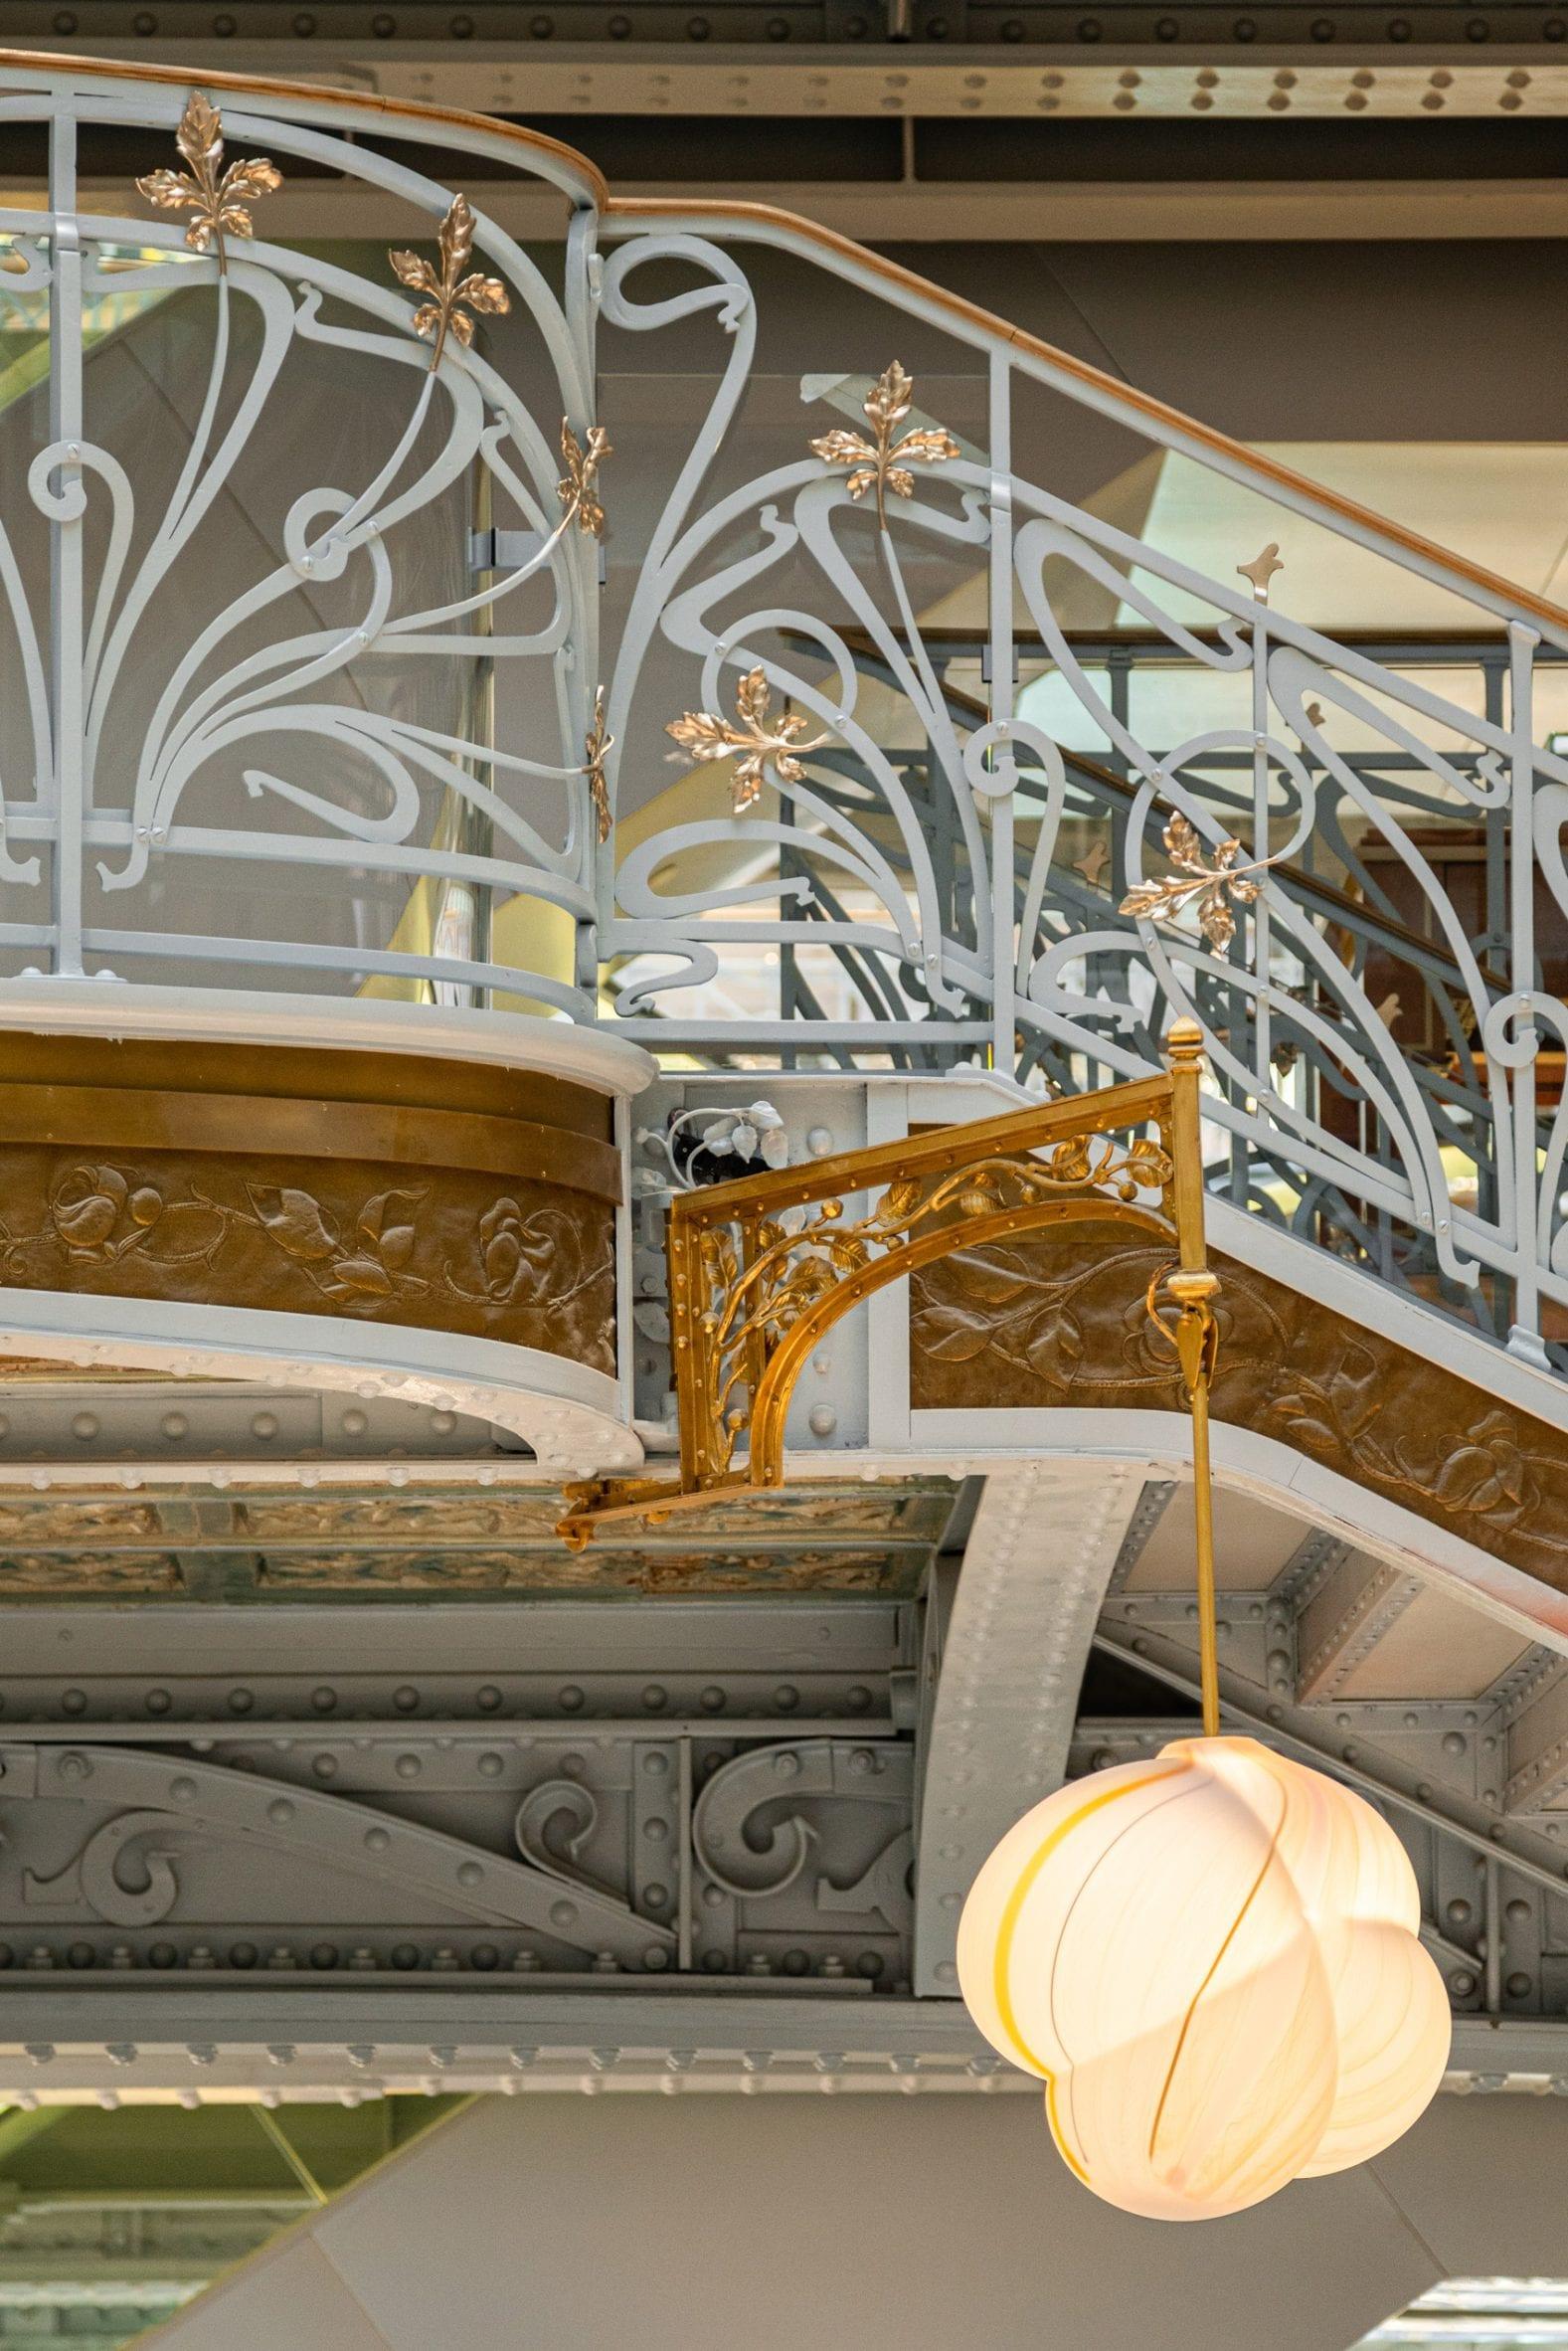 la-samaritaine-sanaa-architecture-renovations-paris-france_dezeen_1704_col_15-scaled.jpg